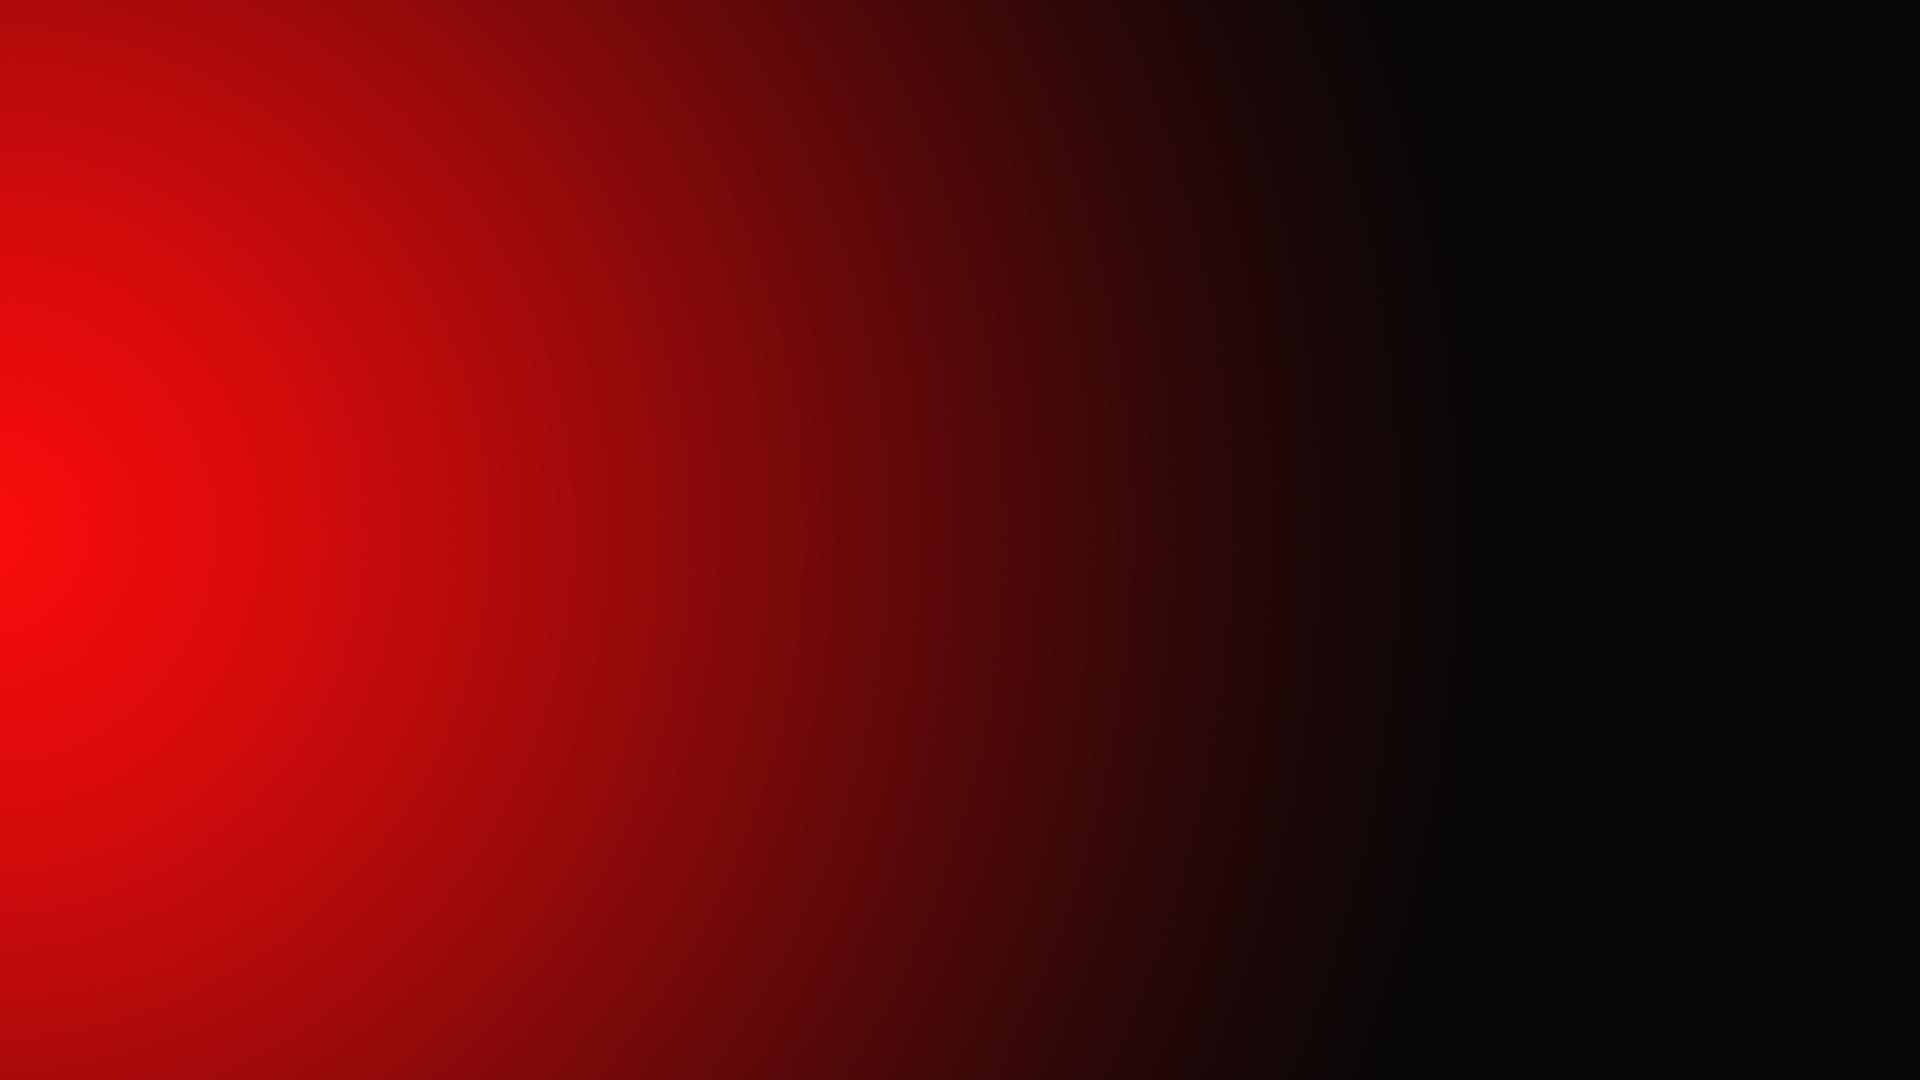 free download comwp contentuploads201210red black gradient destop wallpaperpng 1920x1080 for your desktop mobile tablet explore 50 dark maroon wallpaper maroon 5 wallpaper desktop maroon wallpaper tumblr maroon wallpaper border dark maroon wallpaper